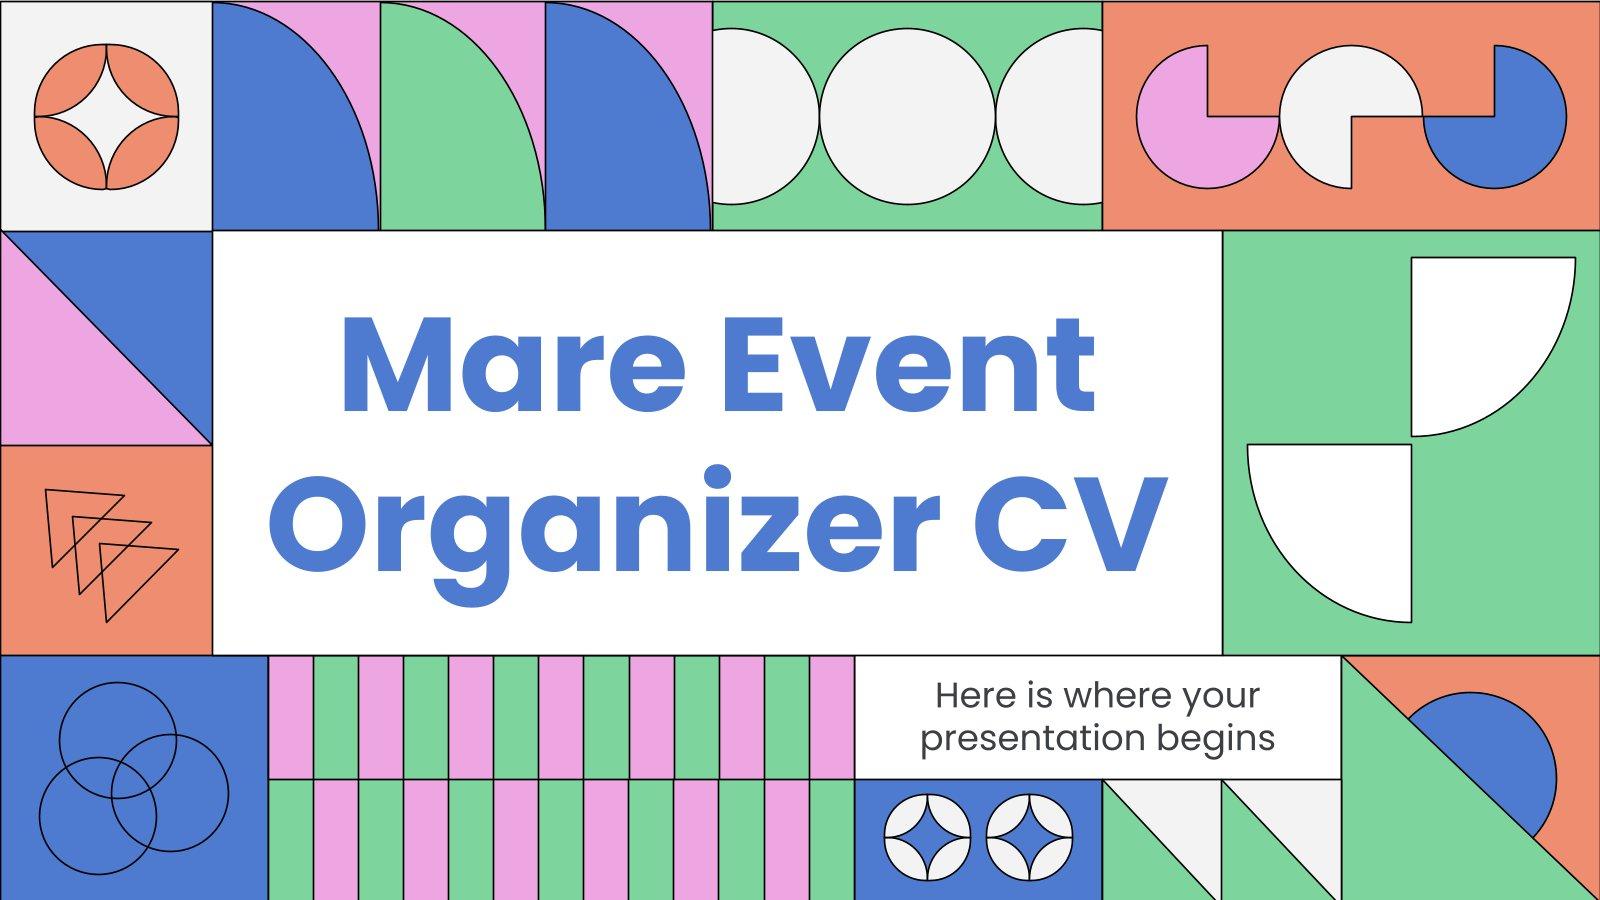 Mare Event Organizer CV presentation template